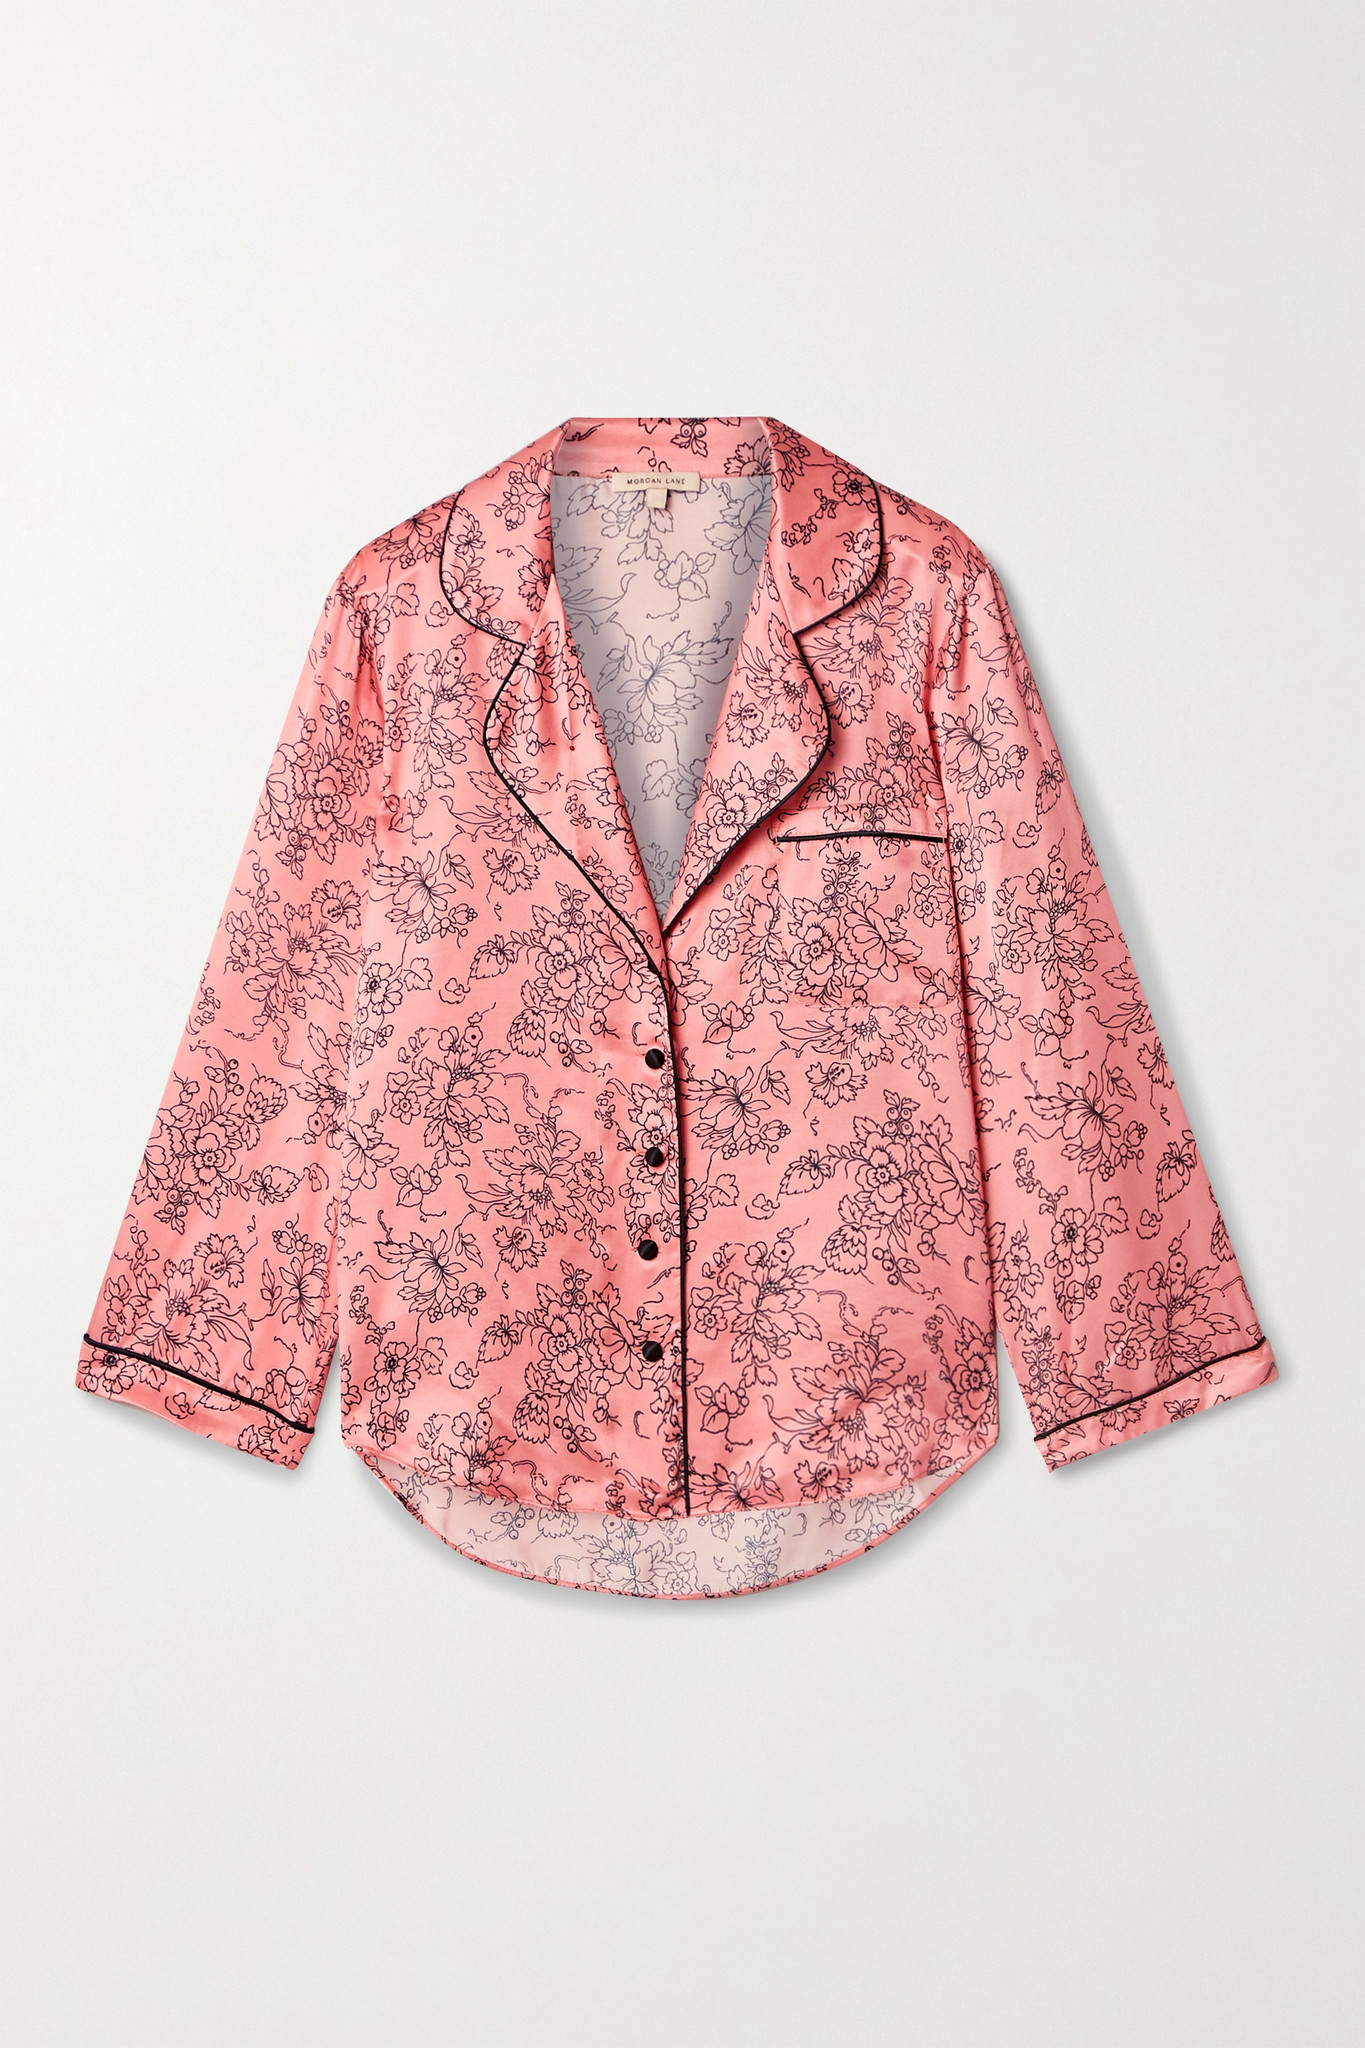 MORGAN LANE - Kinsley Piped Floral-print Satin Pajama Top - Pink - large